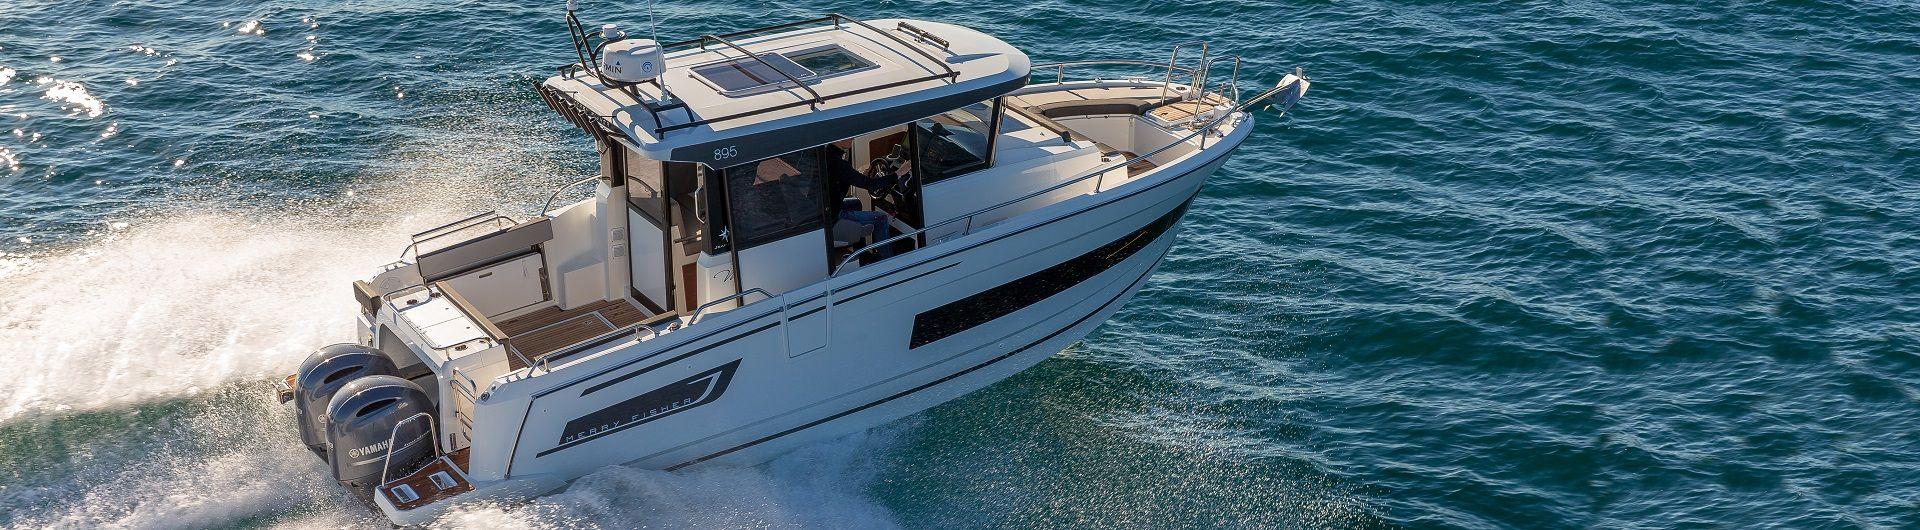 Sportboot Jeanneau Merry Fisher 895 Marlin Header